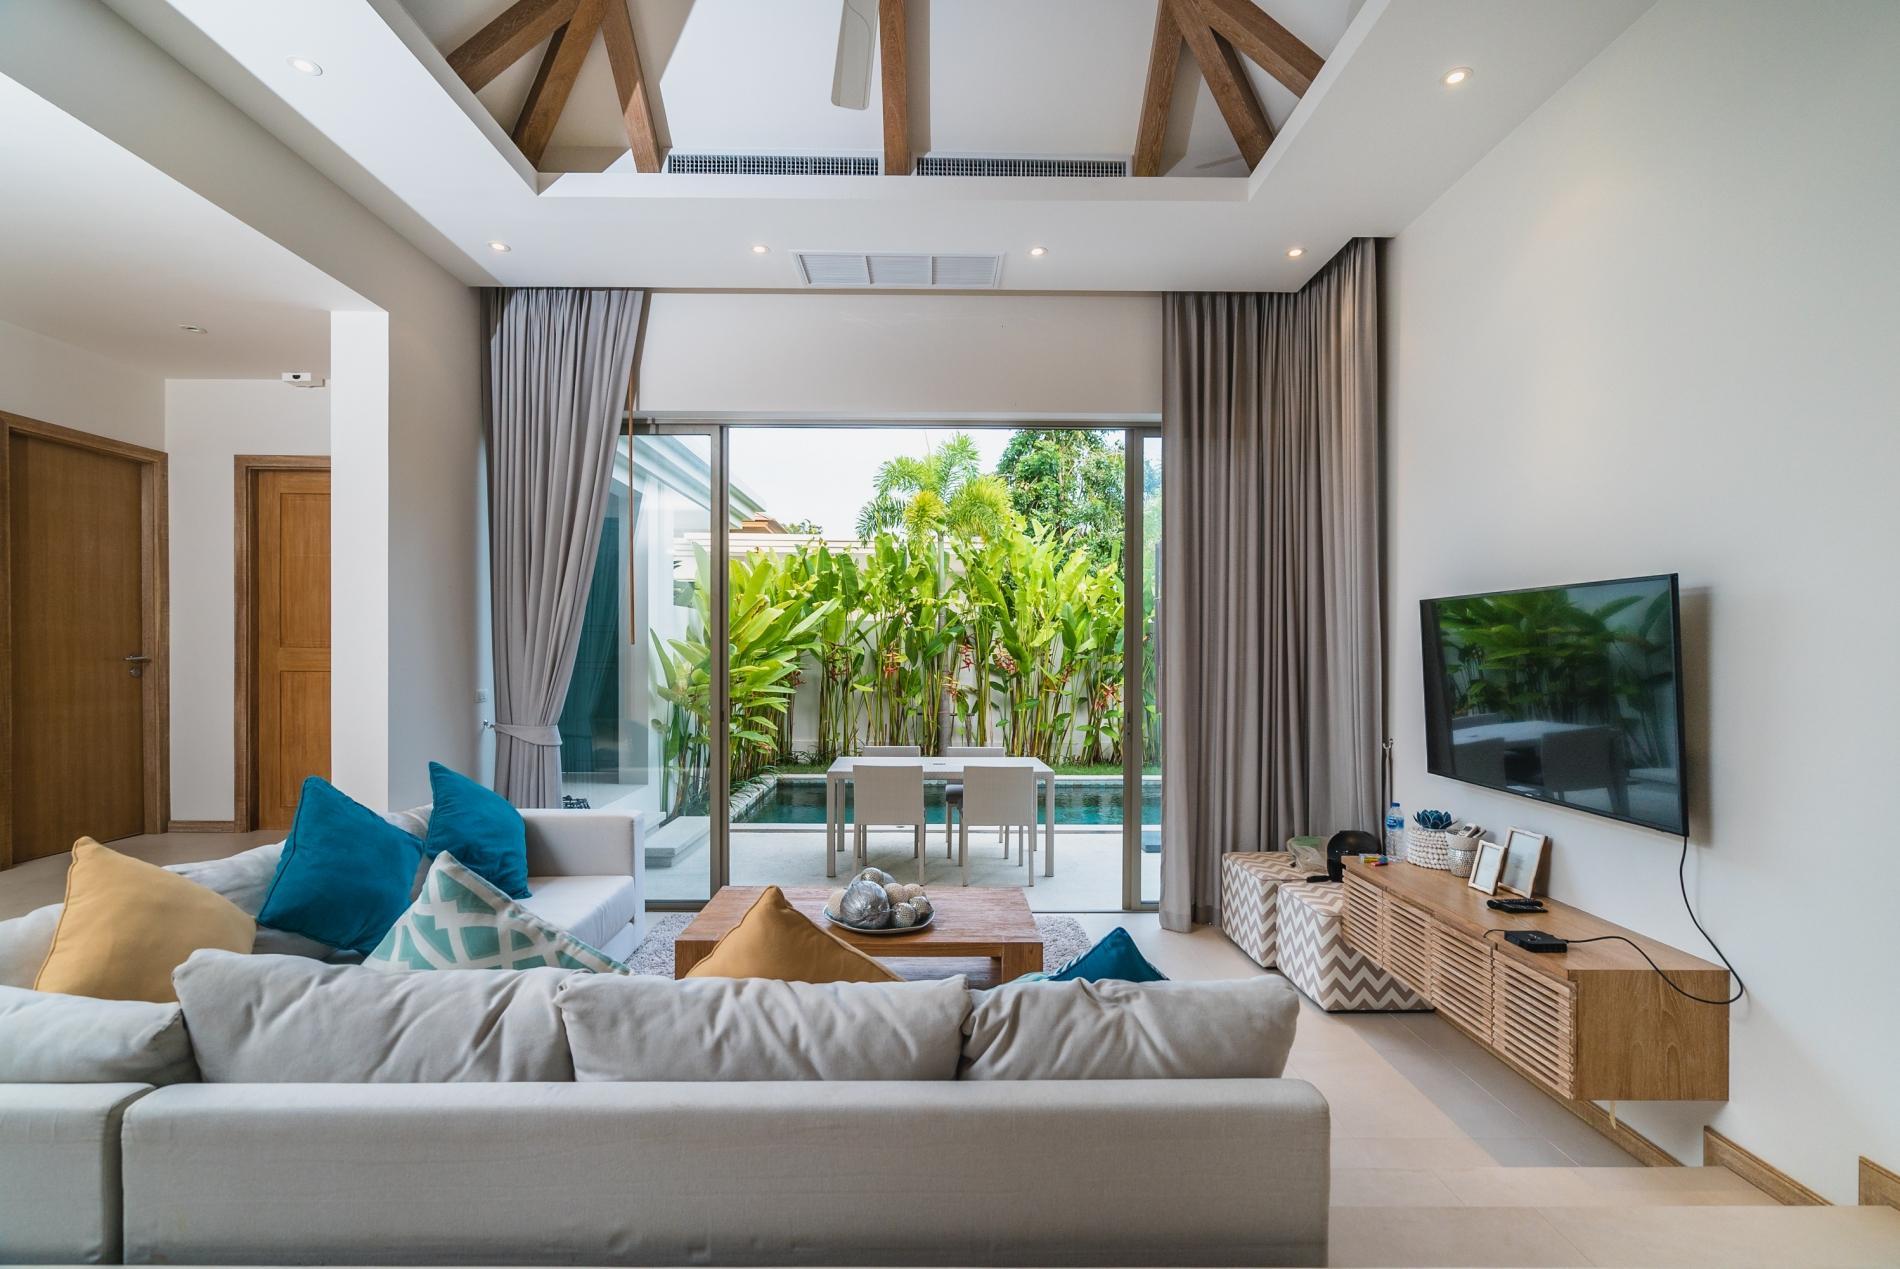 Apartment Trichada 18 - Private pool modern 3 bedroom villa photo 18673282